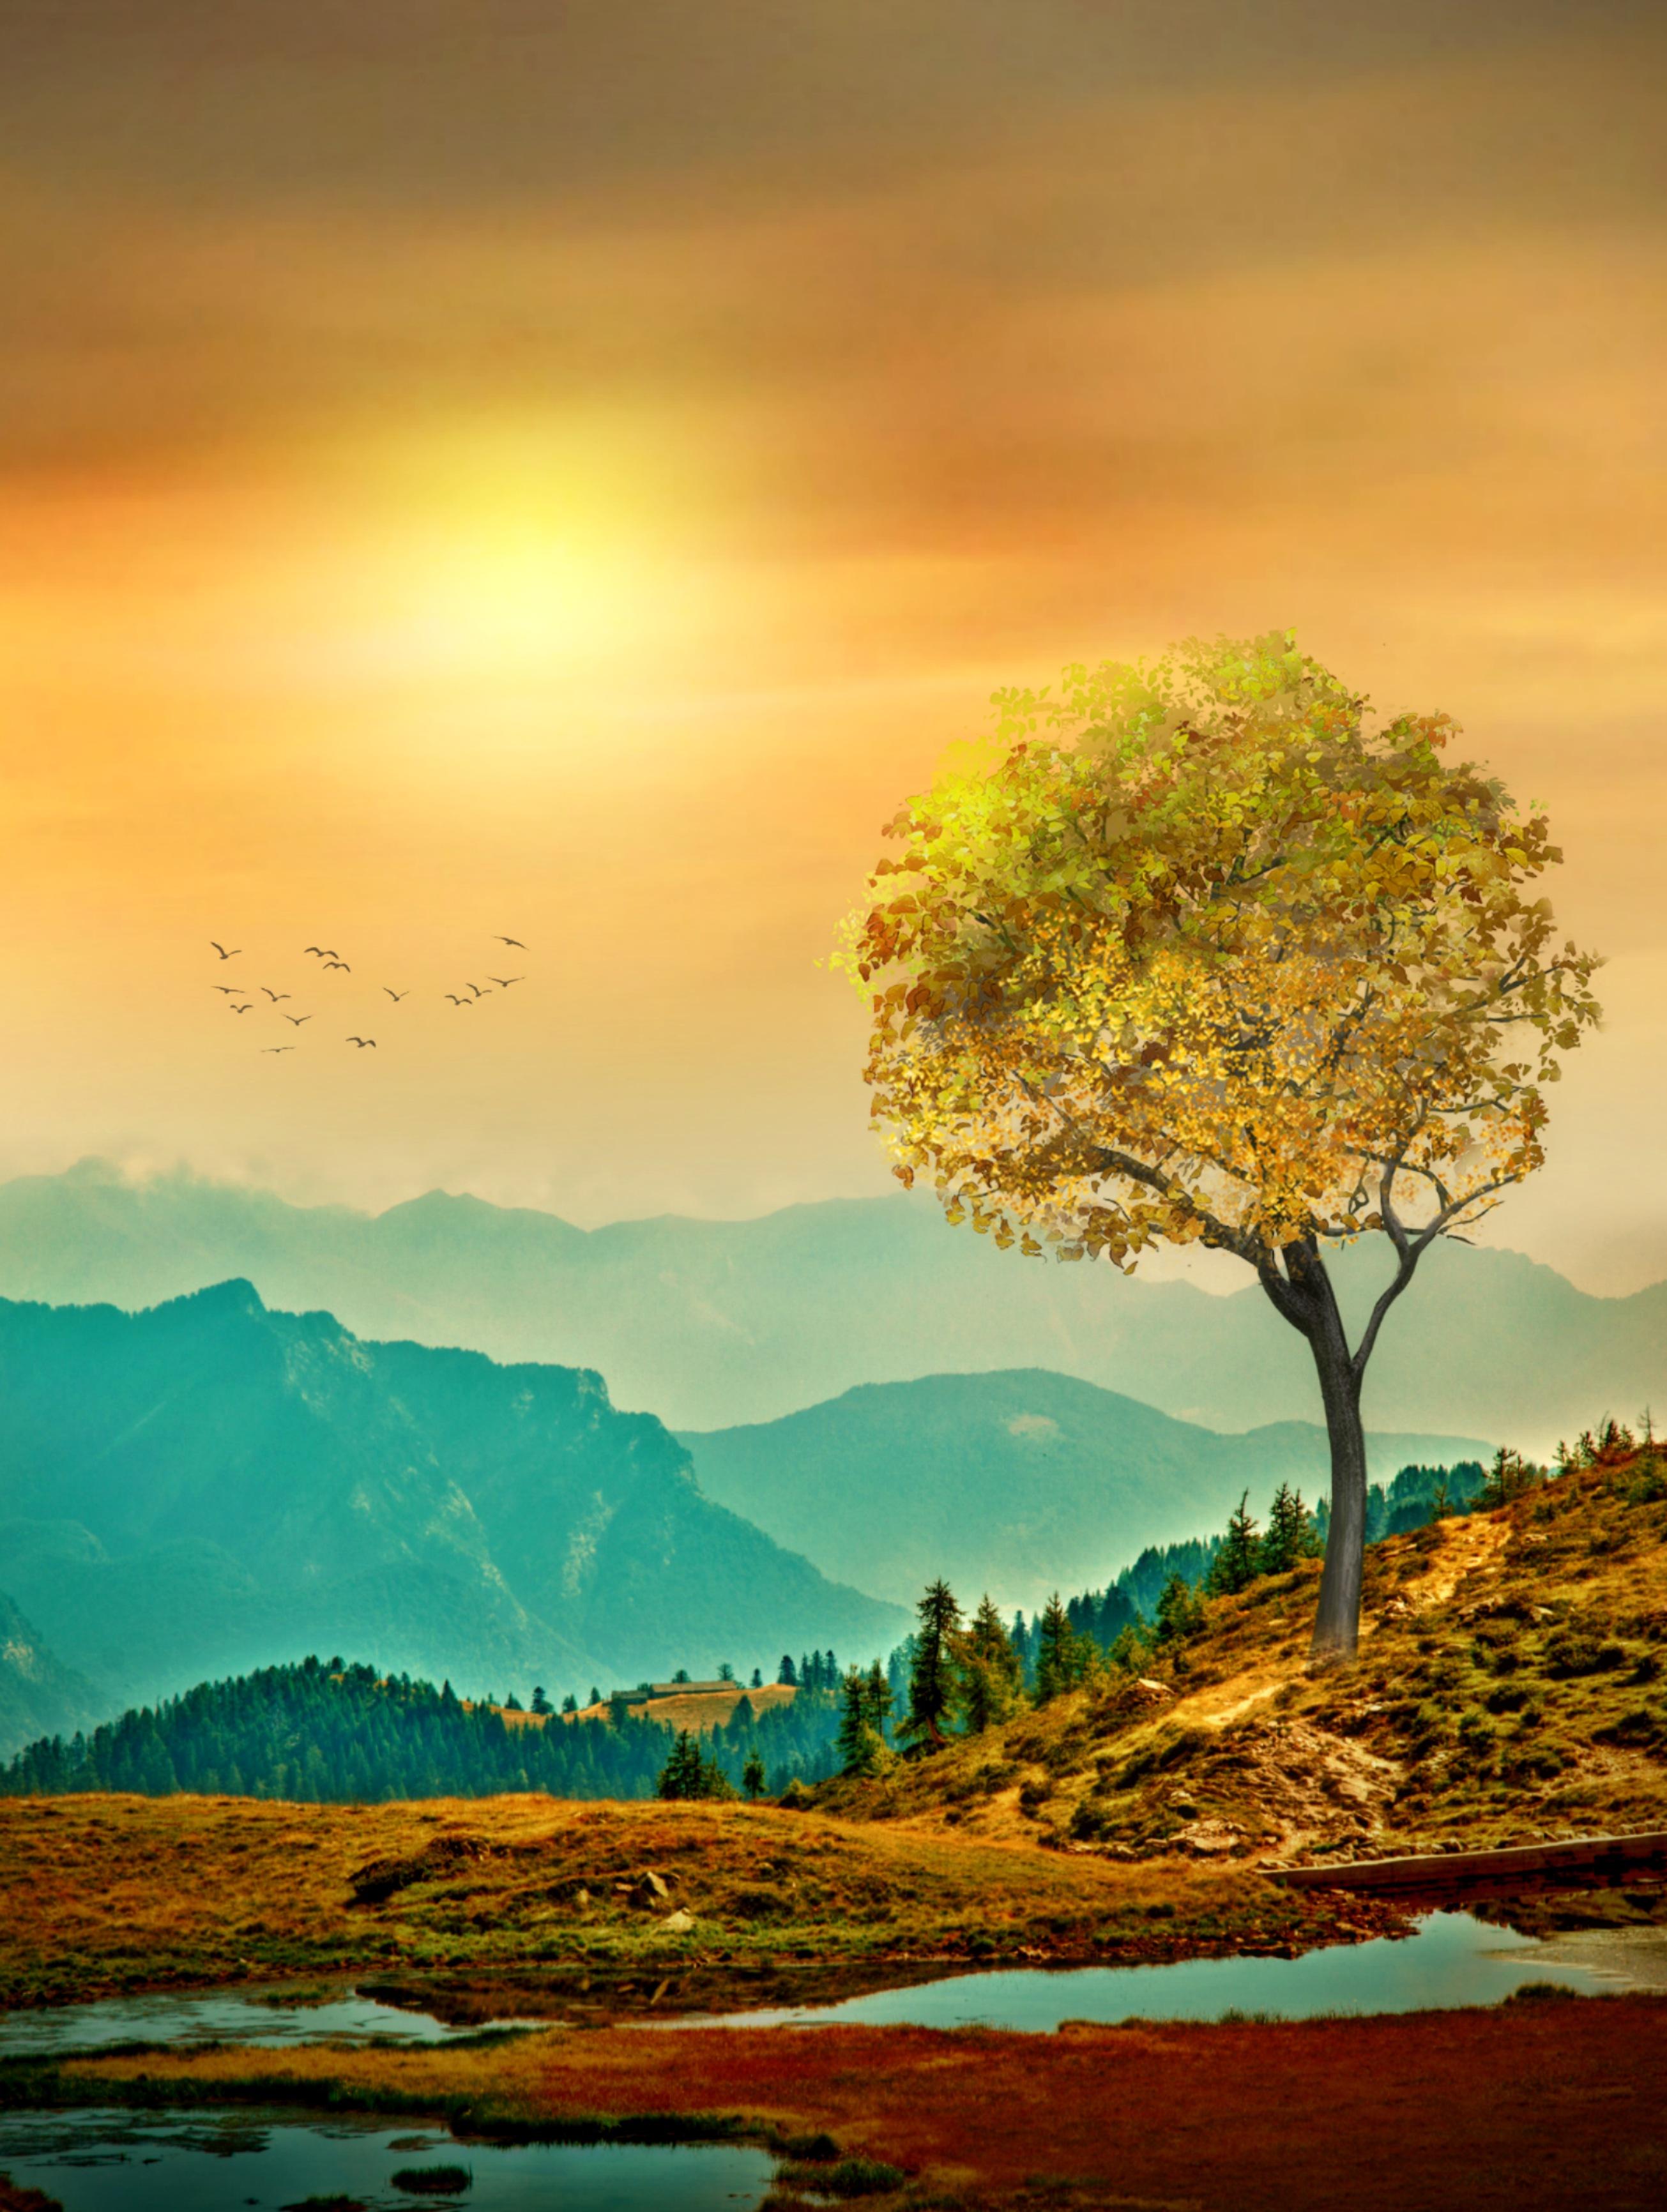 #myedit #madewithpicsart #landscape #colorful @picsart @freetoedit